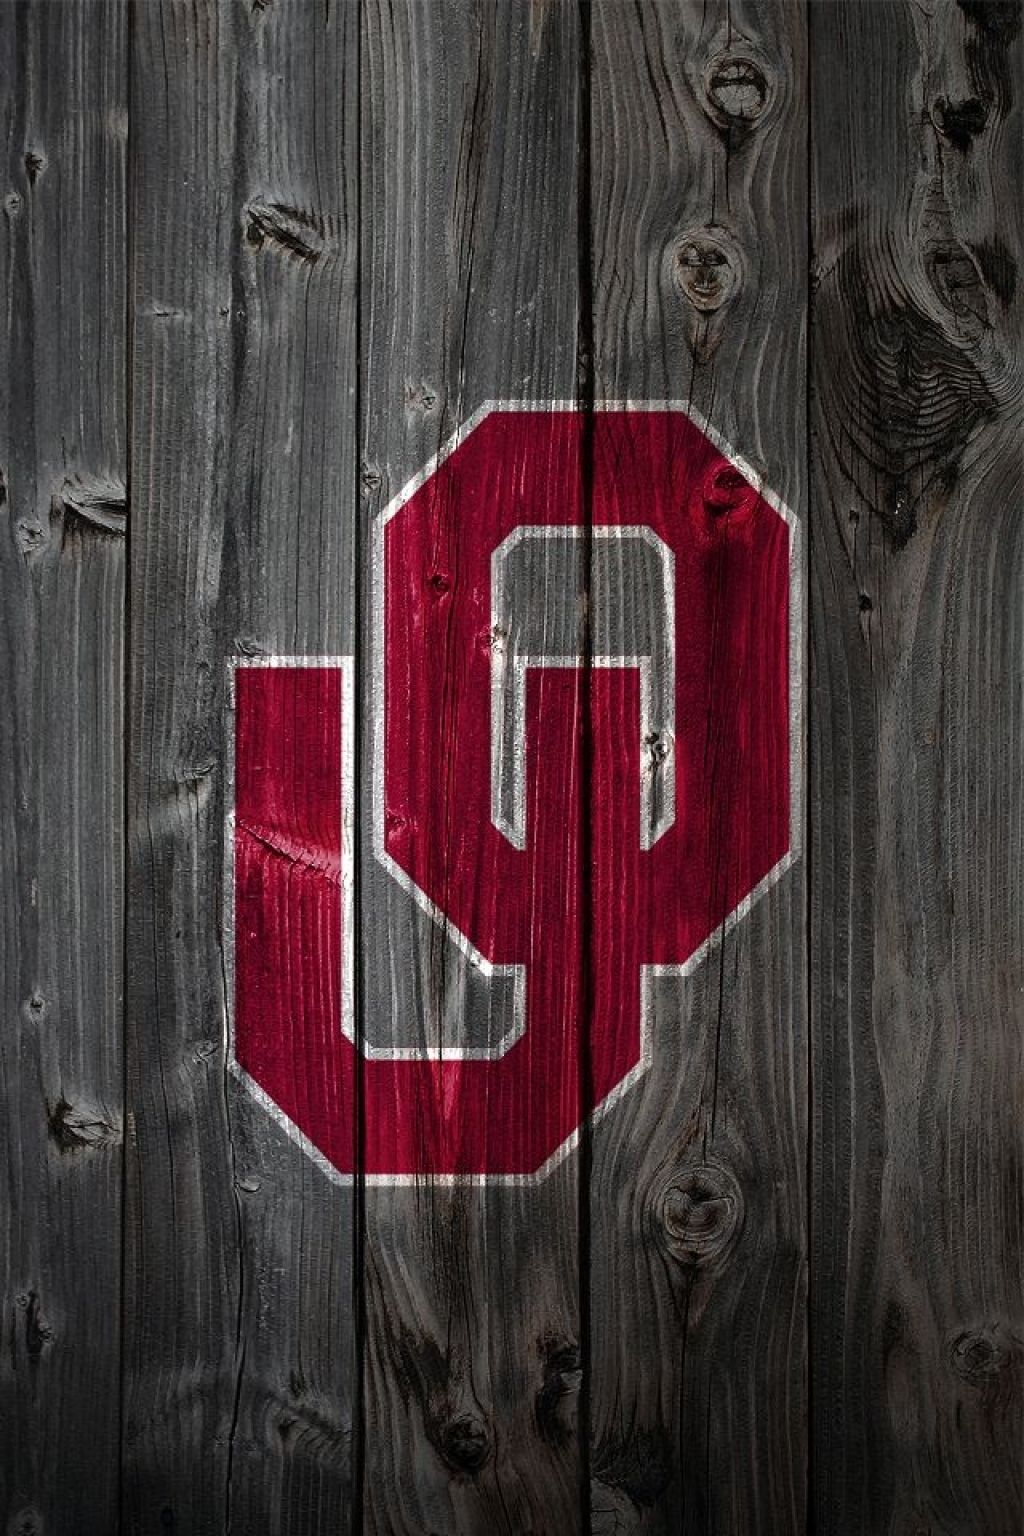 Oklahoma Sooners Wallpapers Source · Oklahoma Sooners Desktop Wallpapers Top Free Oklahoma Sooners